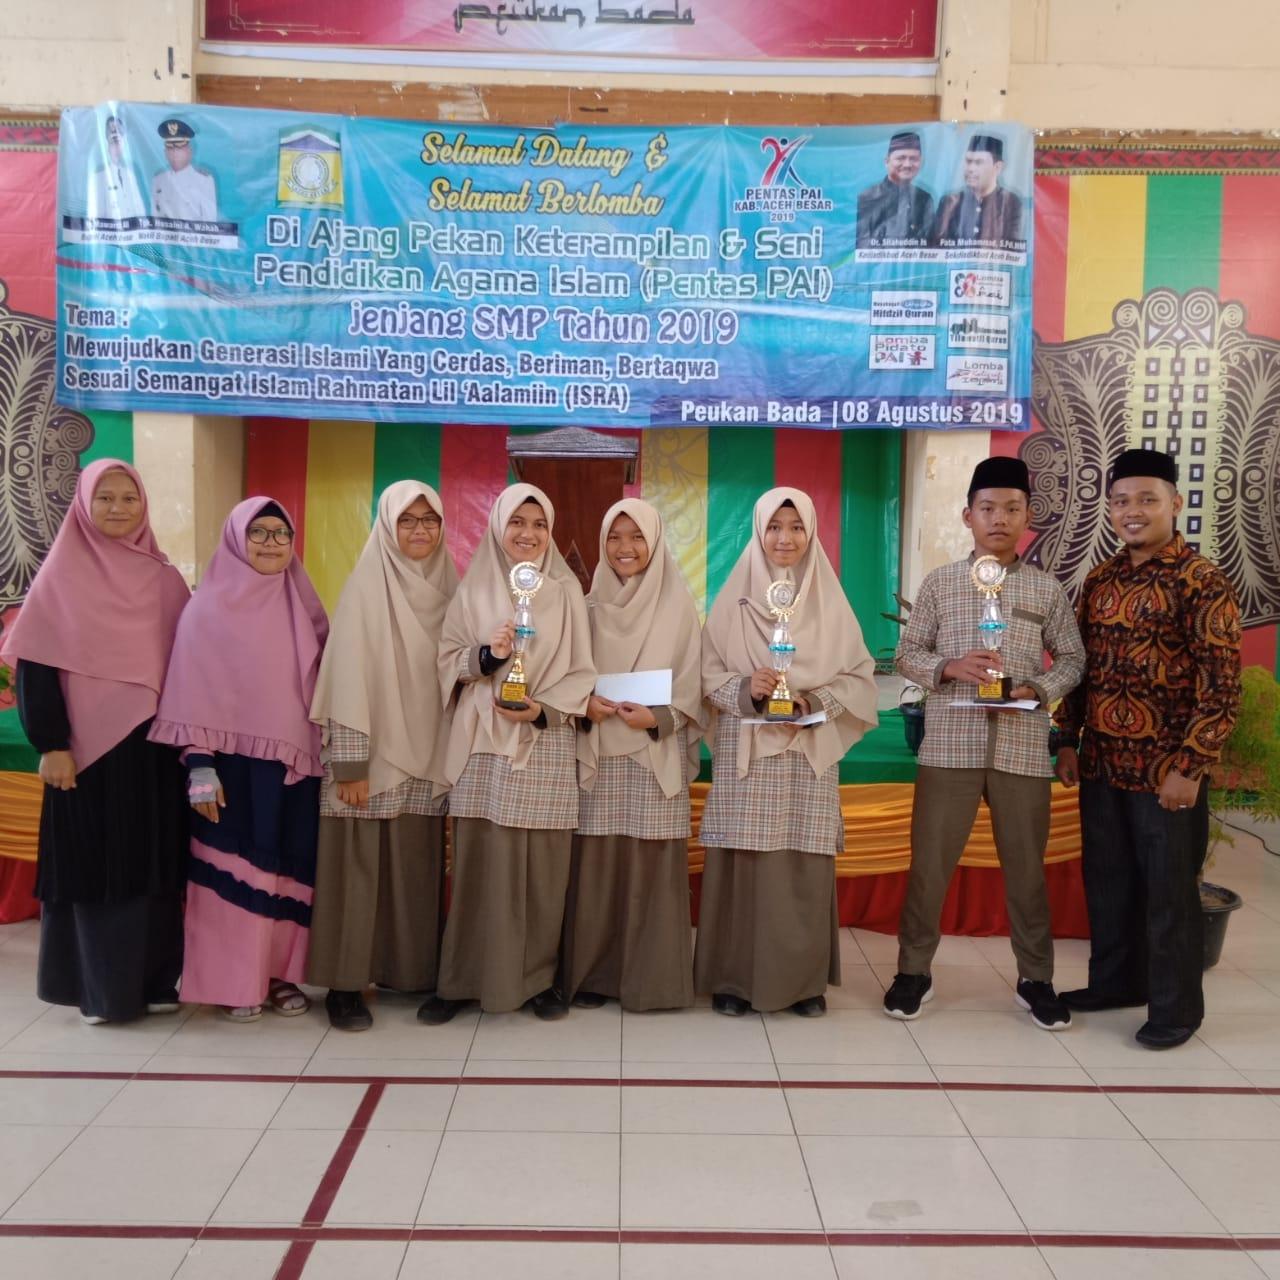 Prestasi Lomba Pentas PAI tingkat Dinas Pendidikan dan Kebudayaan Aceh Besar